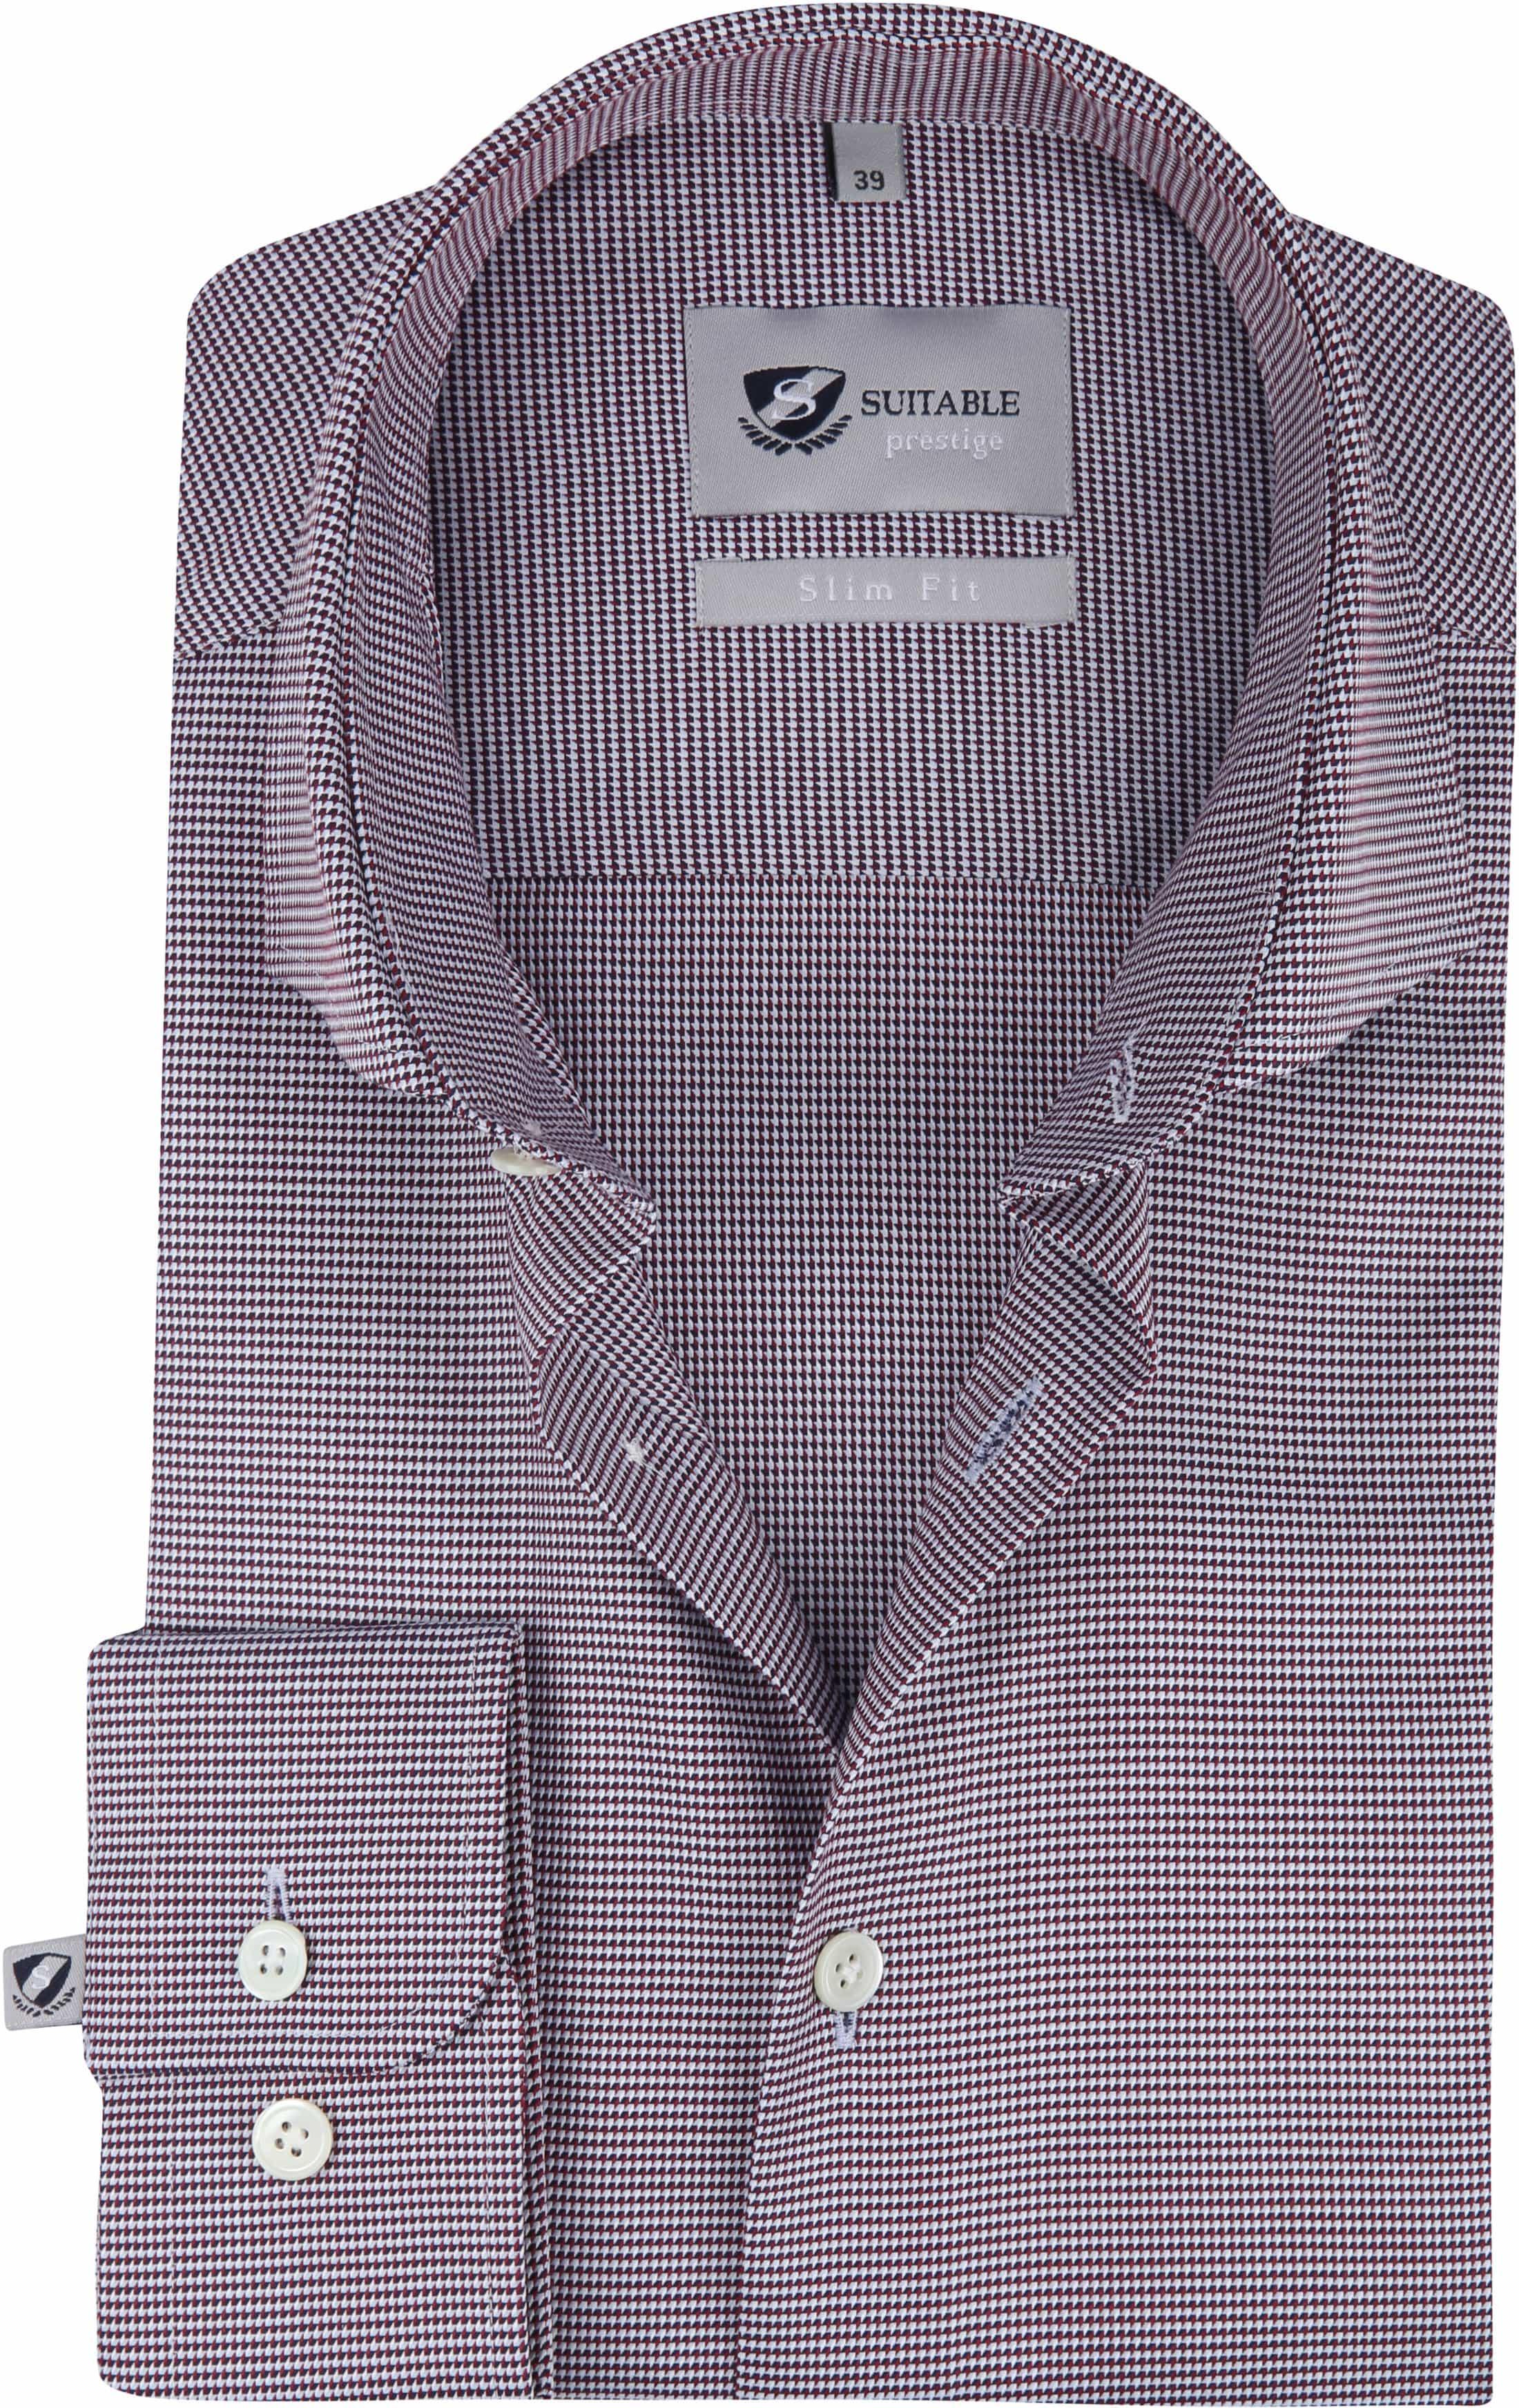 Bordeaux Overhemd.Suitable Overhemd Bordeaux 187 3 187 3 Monti Dessin Online Bestellen